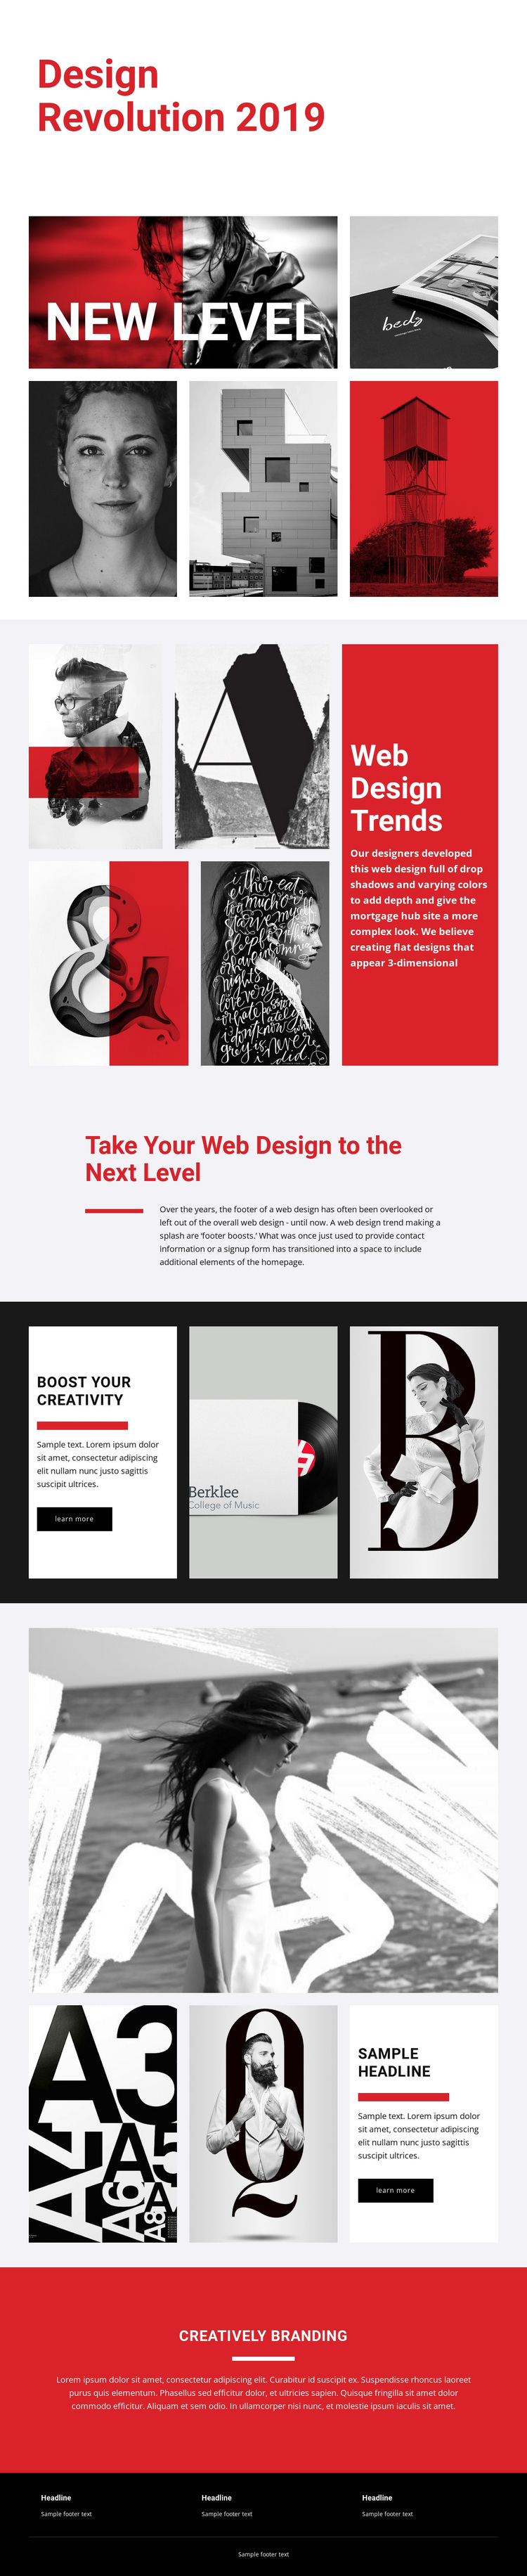 Revolution of designing art Joomla Page Builder